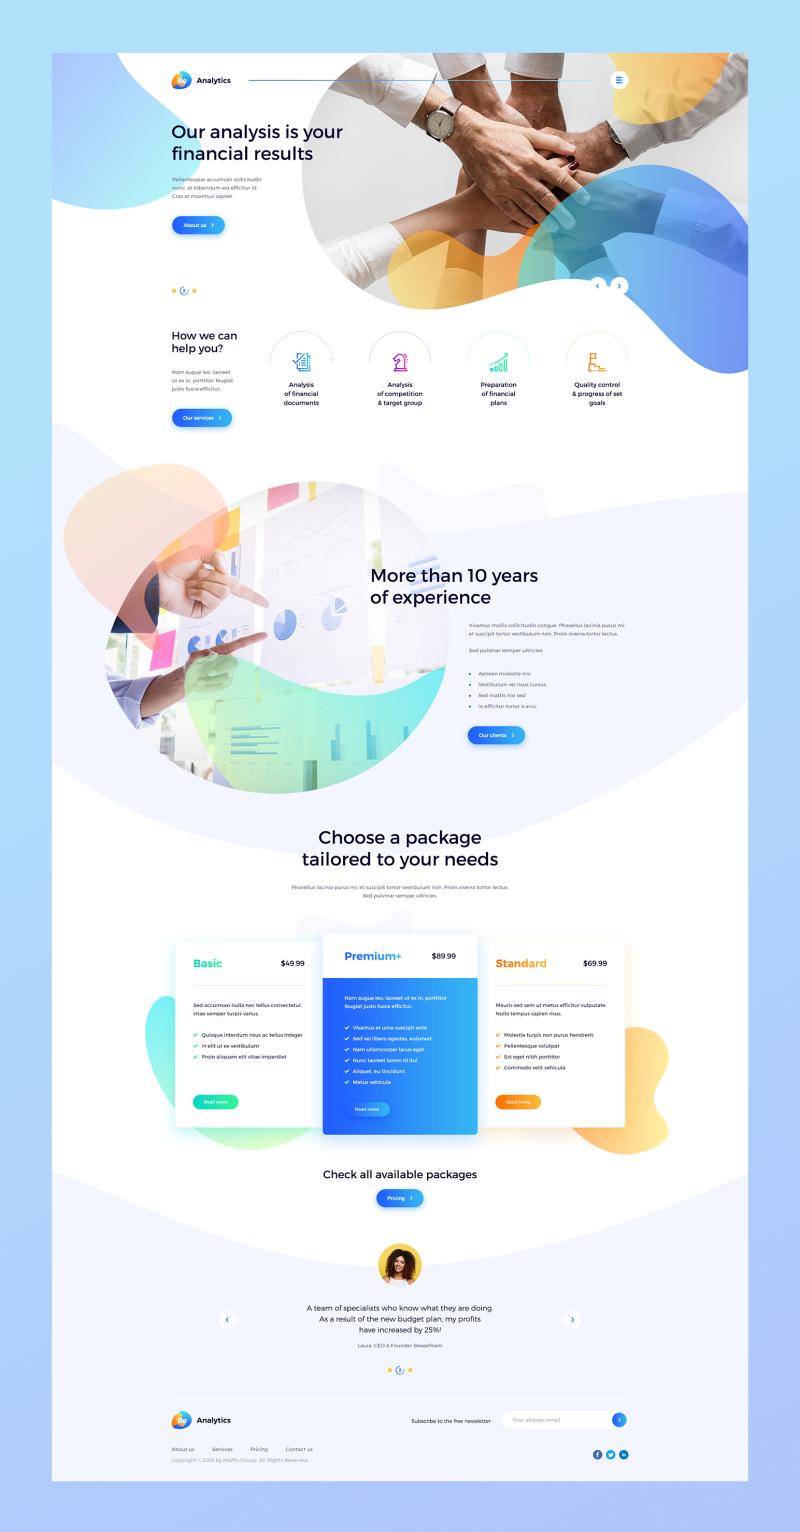 Organic Shapes Web Design 2020 Google Search In 2020 Website Design Layout Web Design Websites Web Layout Design